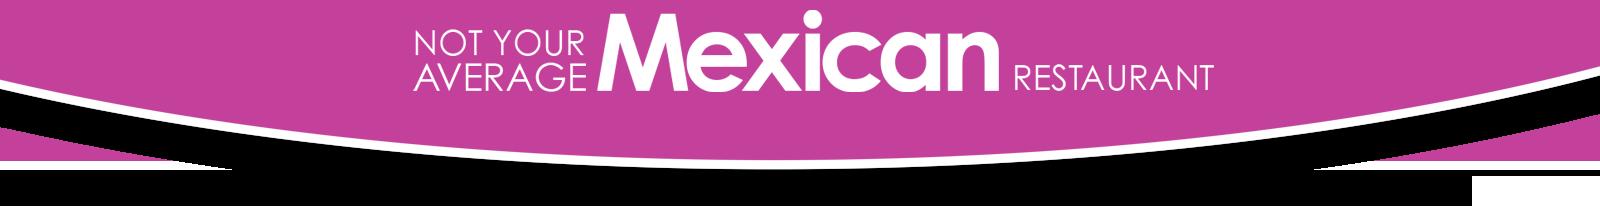 Desert clipart village mexican. Dahlia kitchen not your